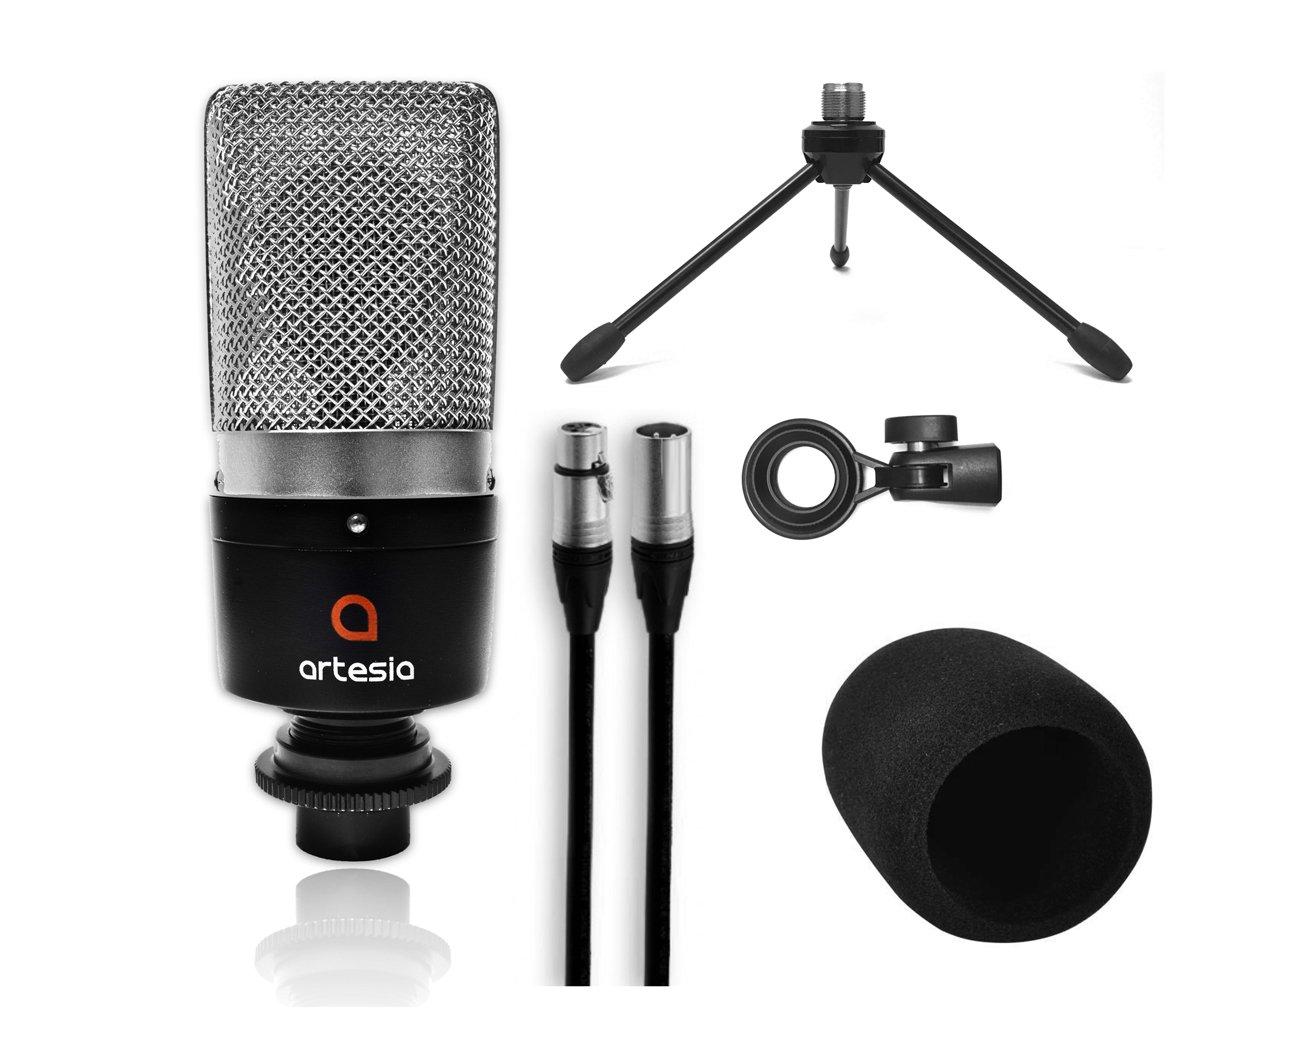 Artesia Pro AMC-10 Studio Condenser Microphone